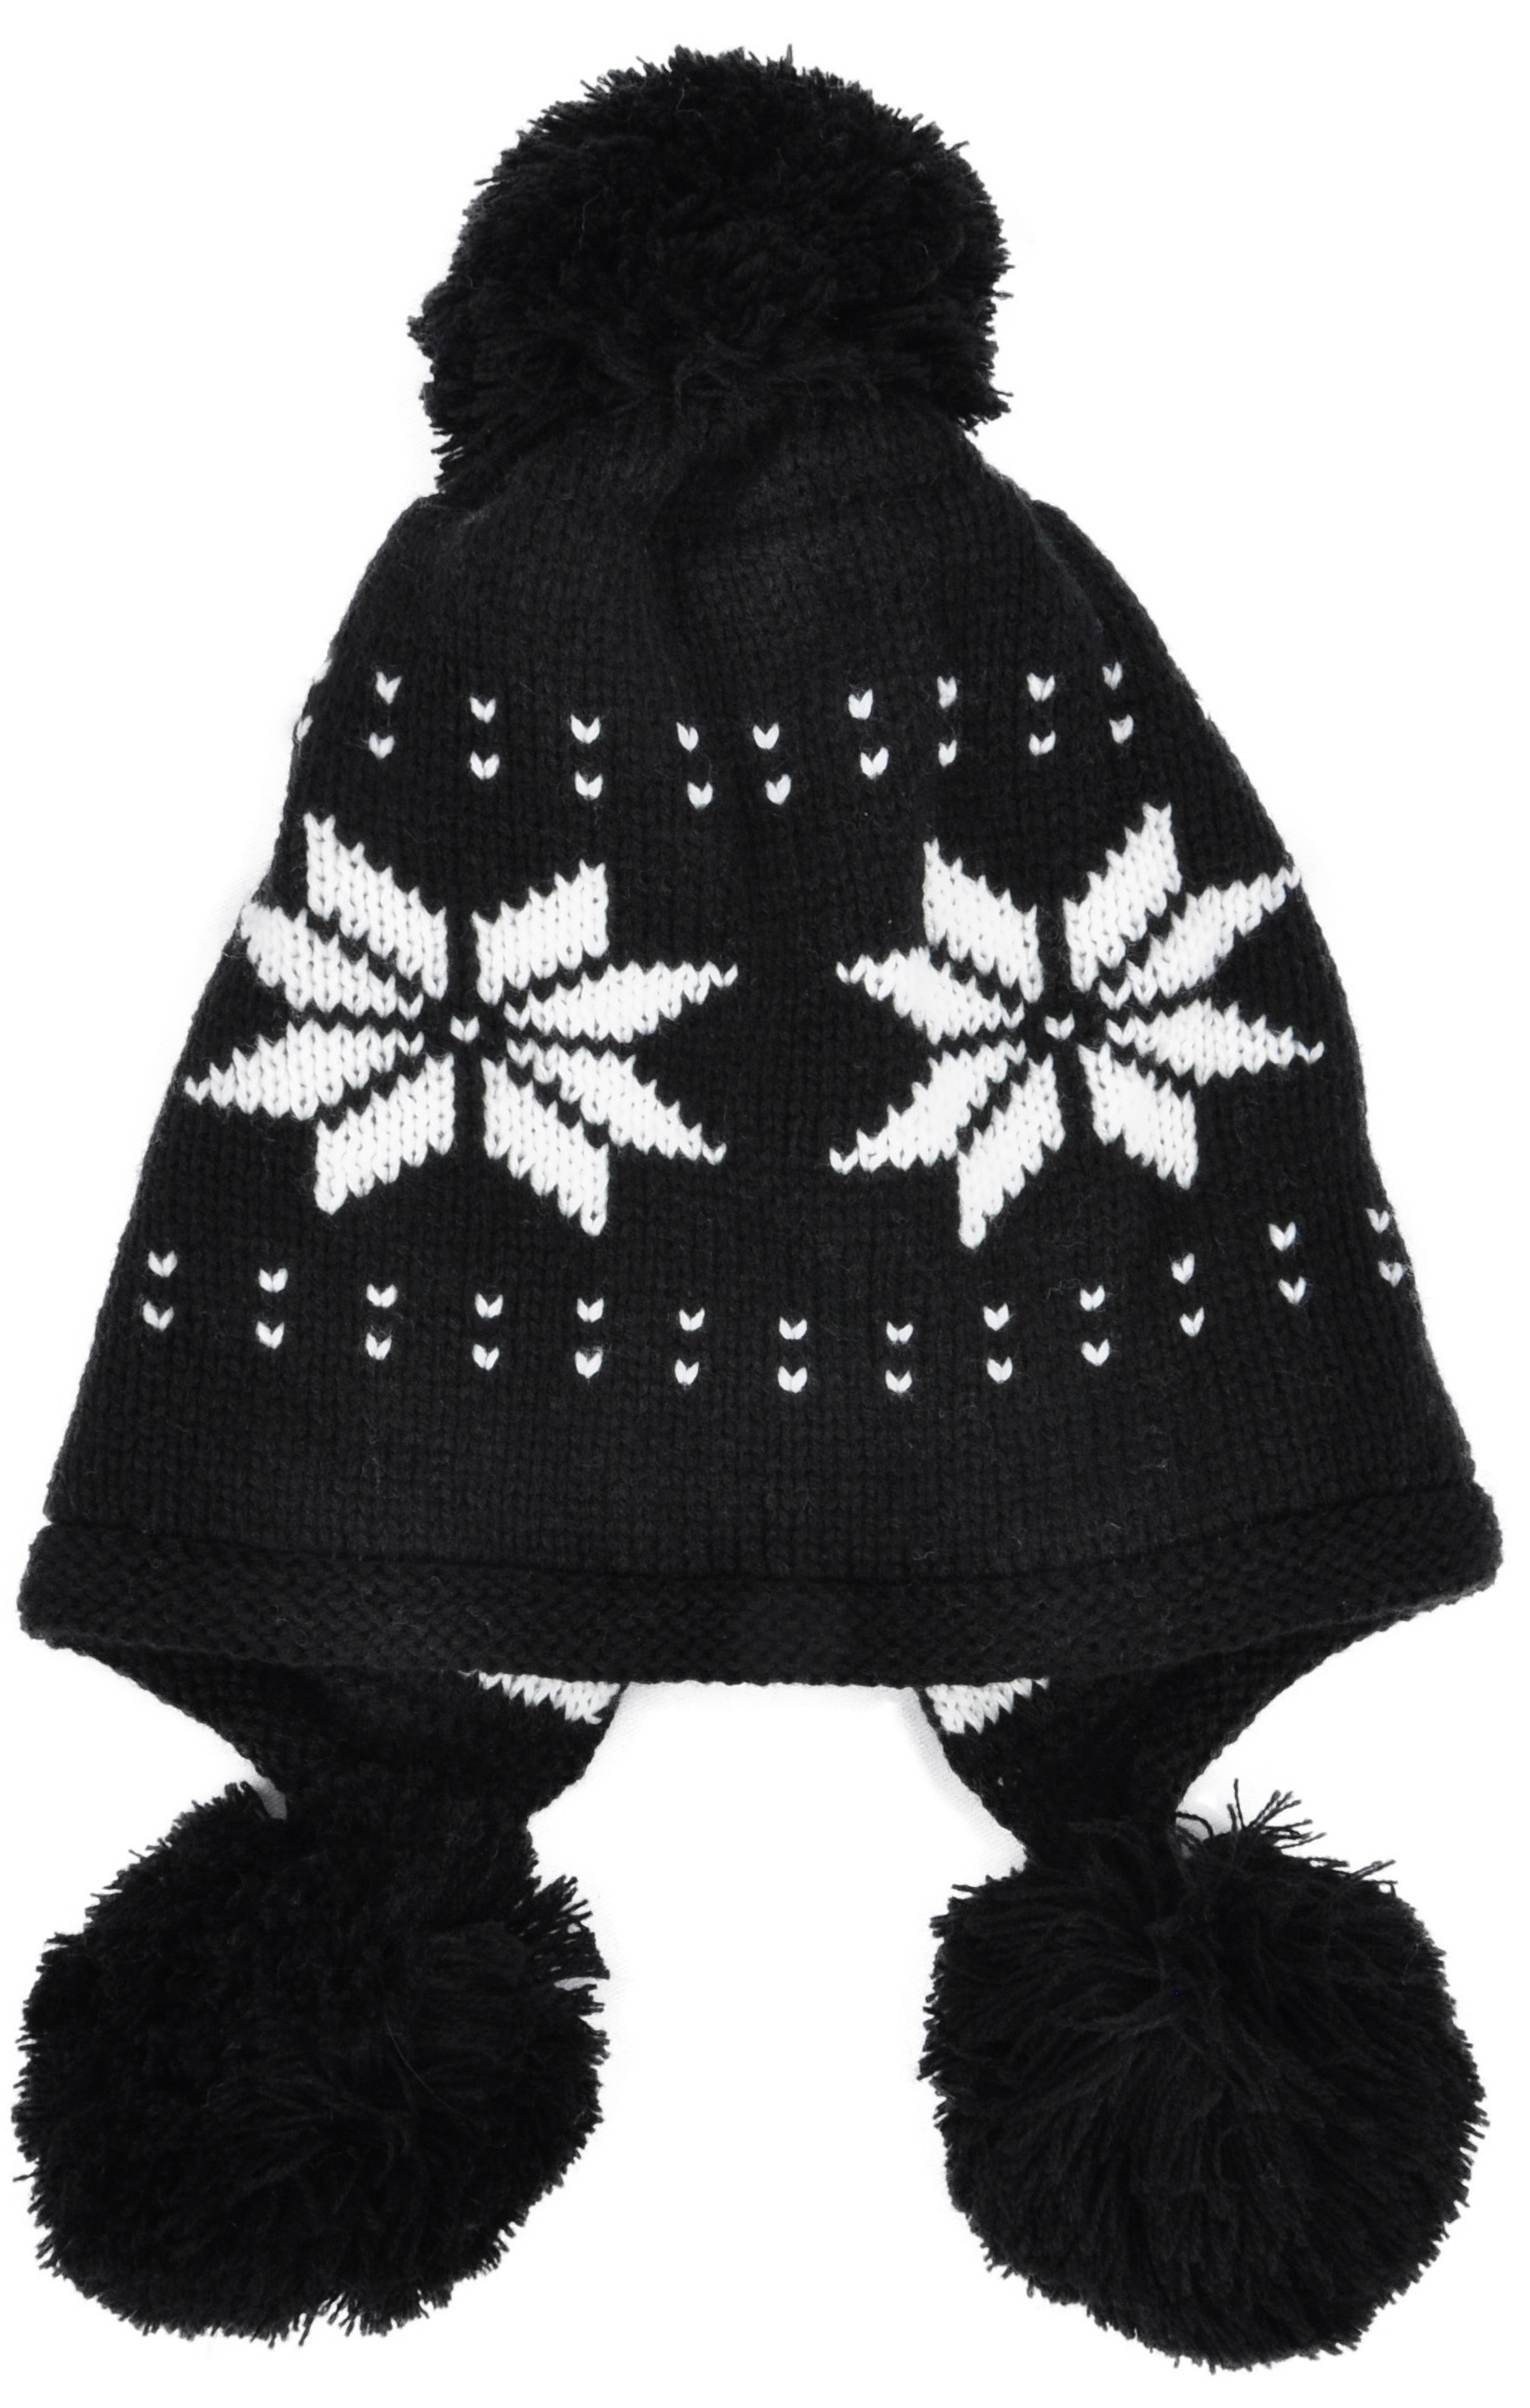 Simplicity Simplicity Womens Knit Ear Flap Winter Hat Beanies